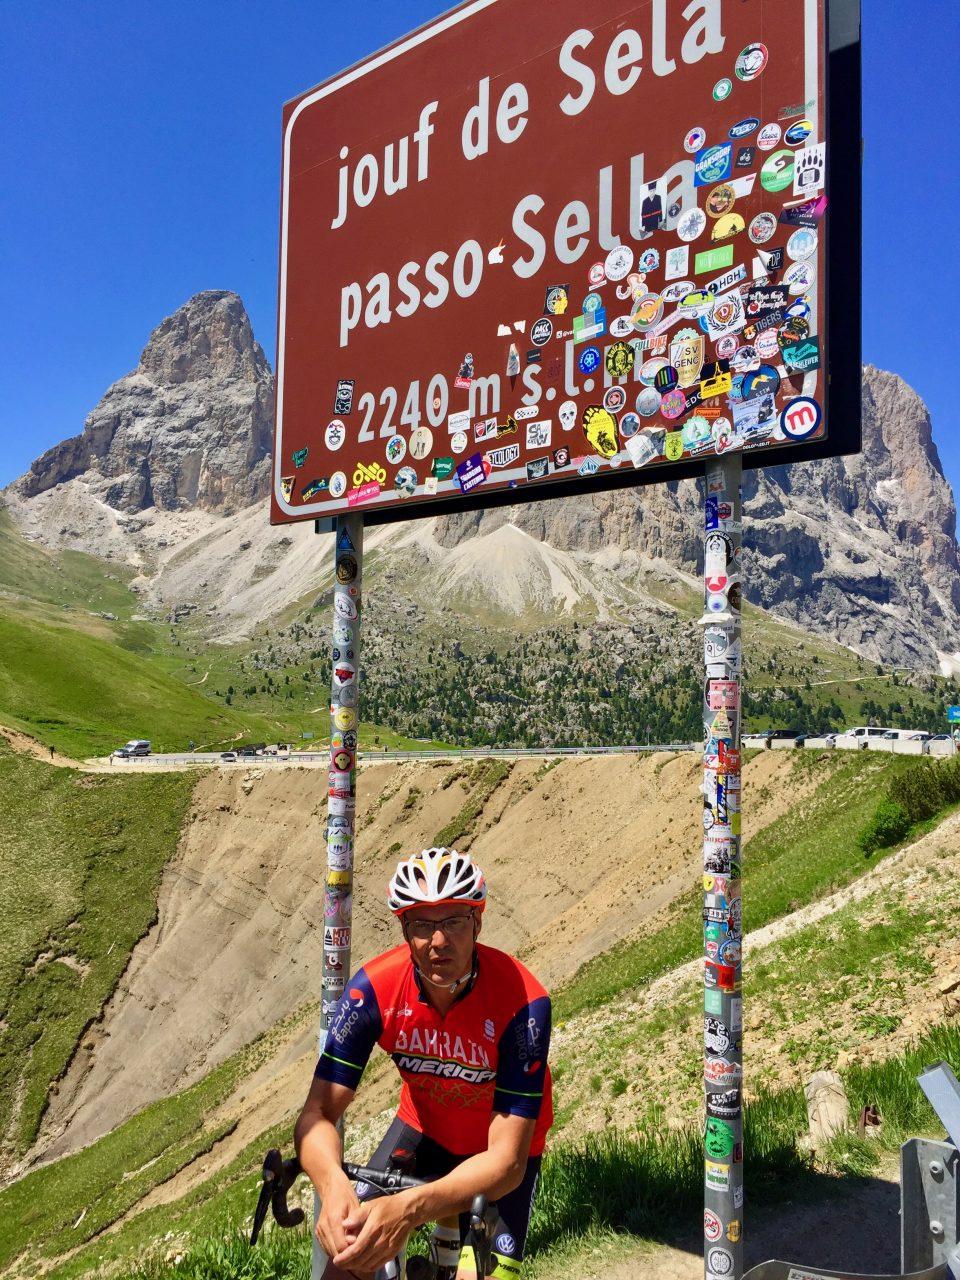 Martin, Passo Sella, Dolomites, Italy